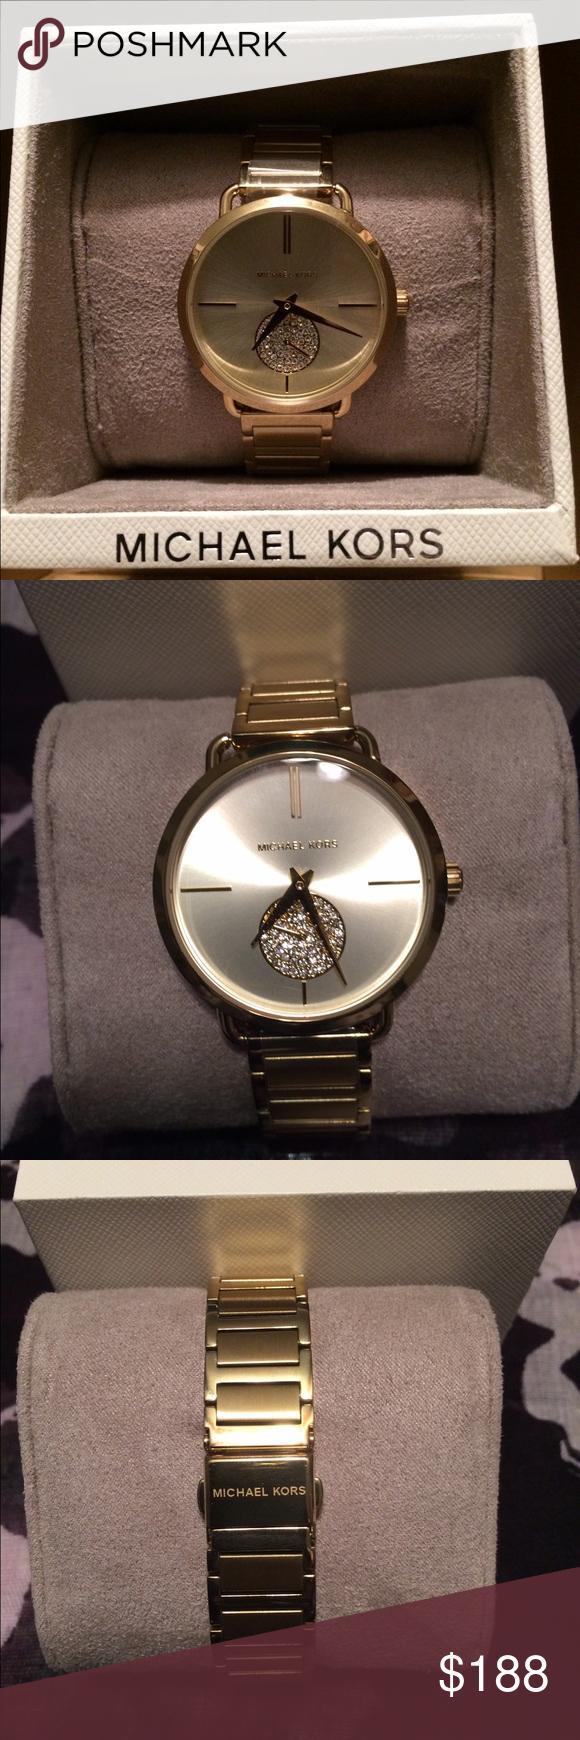 e0d6e5cb67a5 Women s Michael Kors Watch Michael Kors Original MK3639 Women s Portia Gold-Tone  Watch. Michael